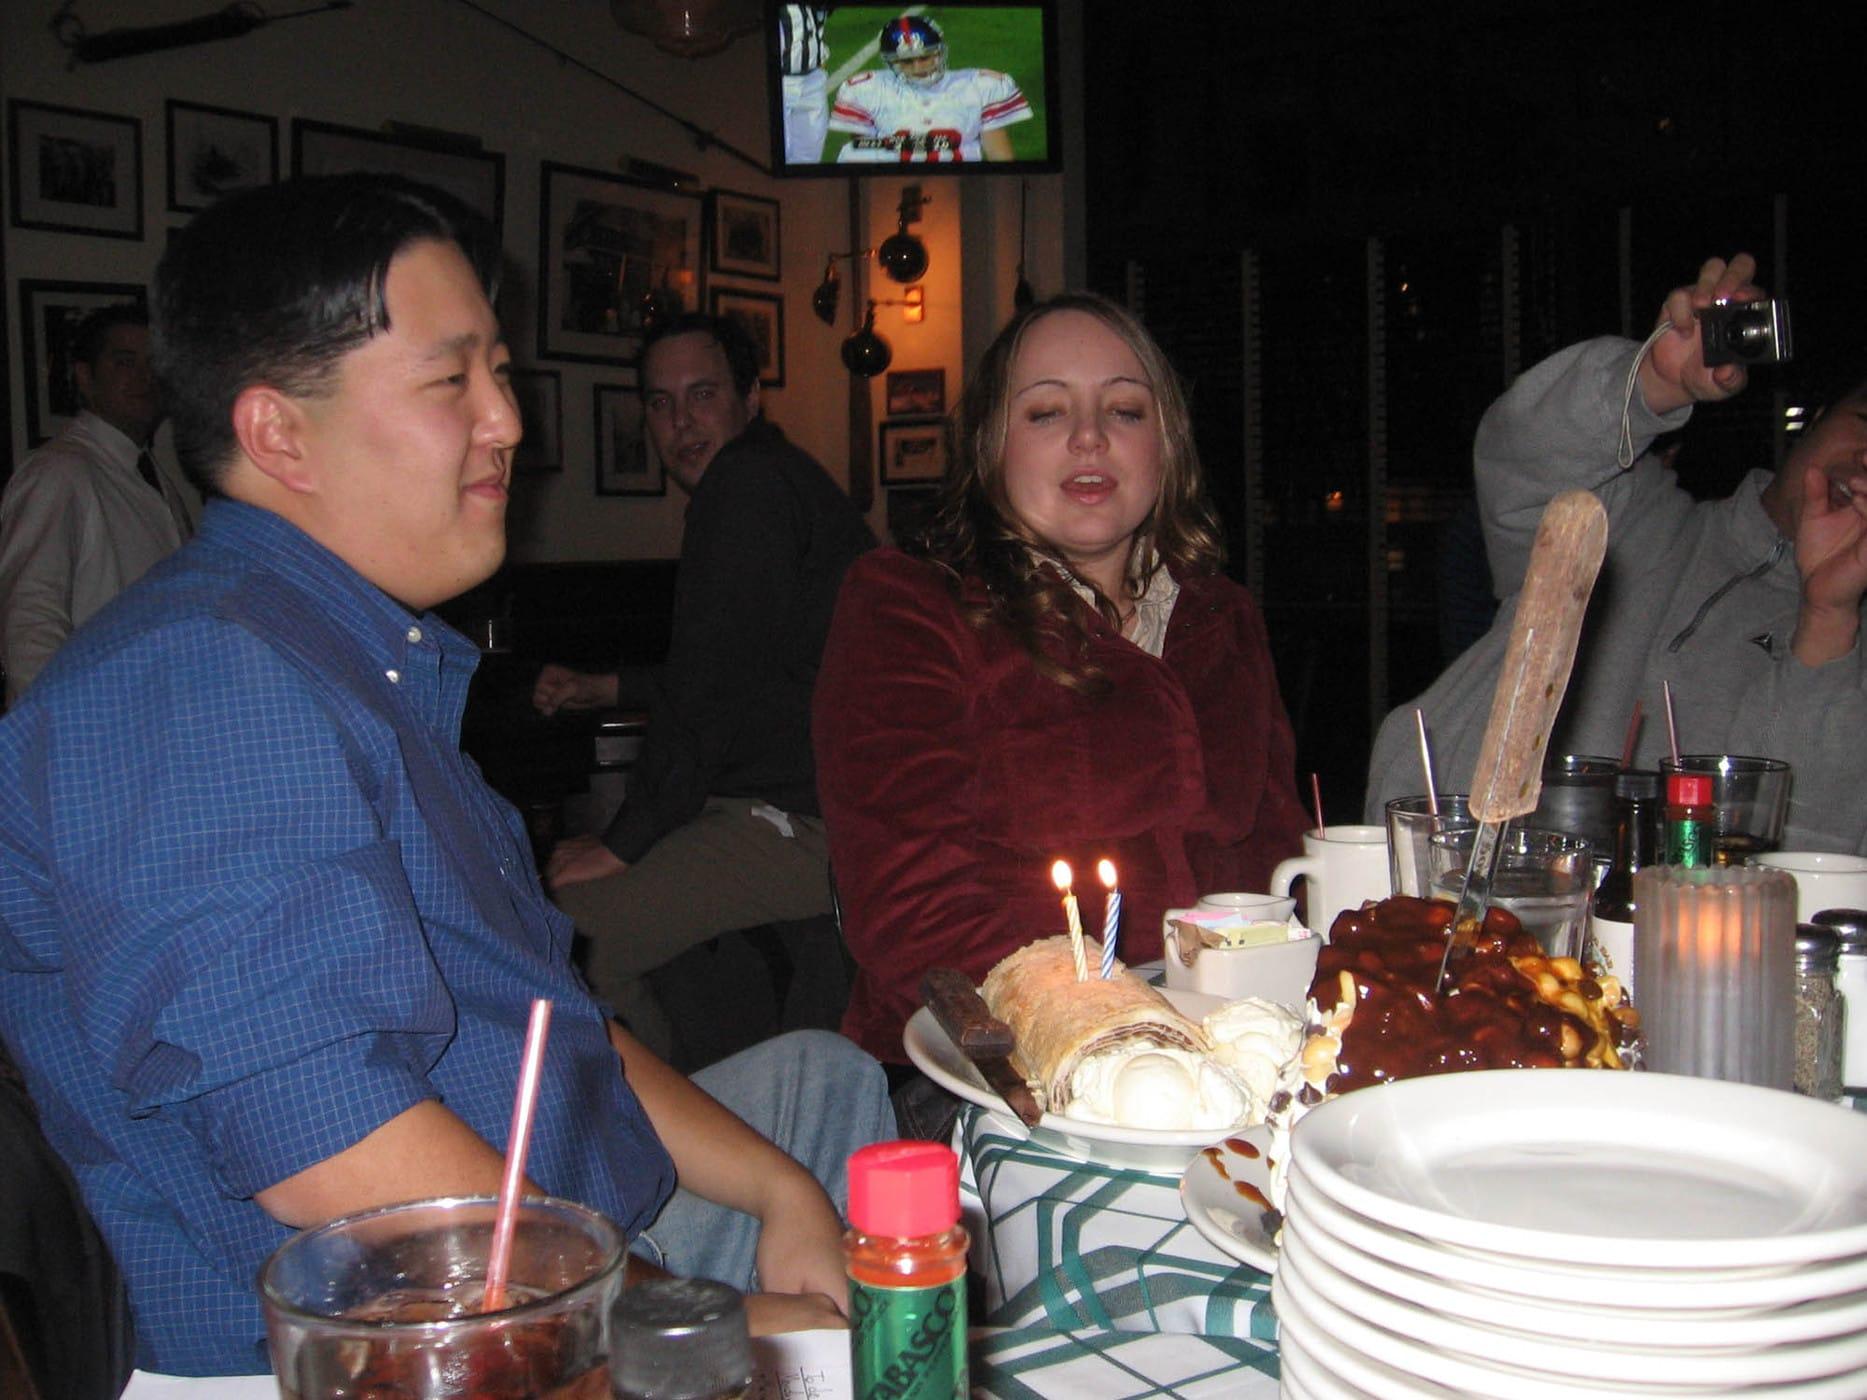 Andy's birthday cake.  - Happy birthday Andy!